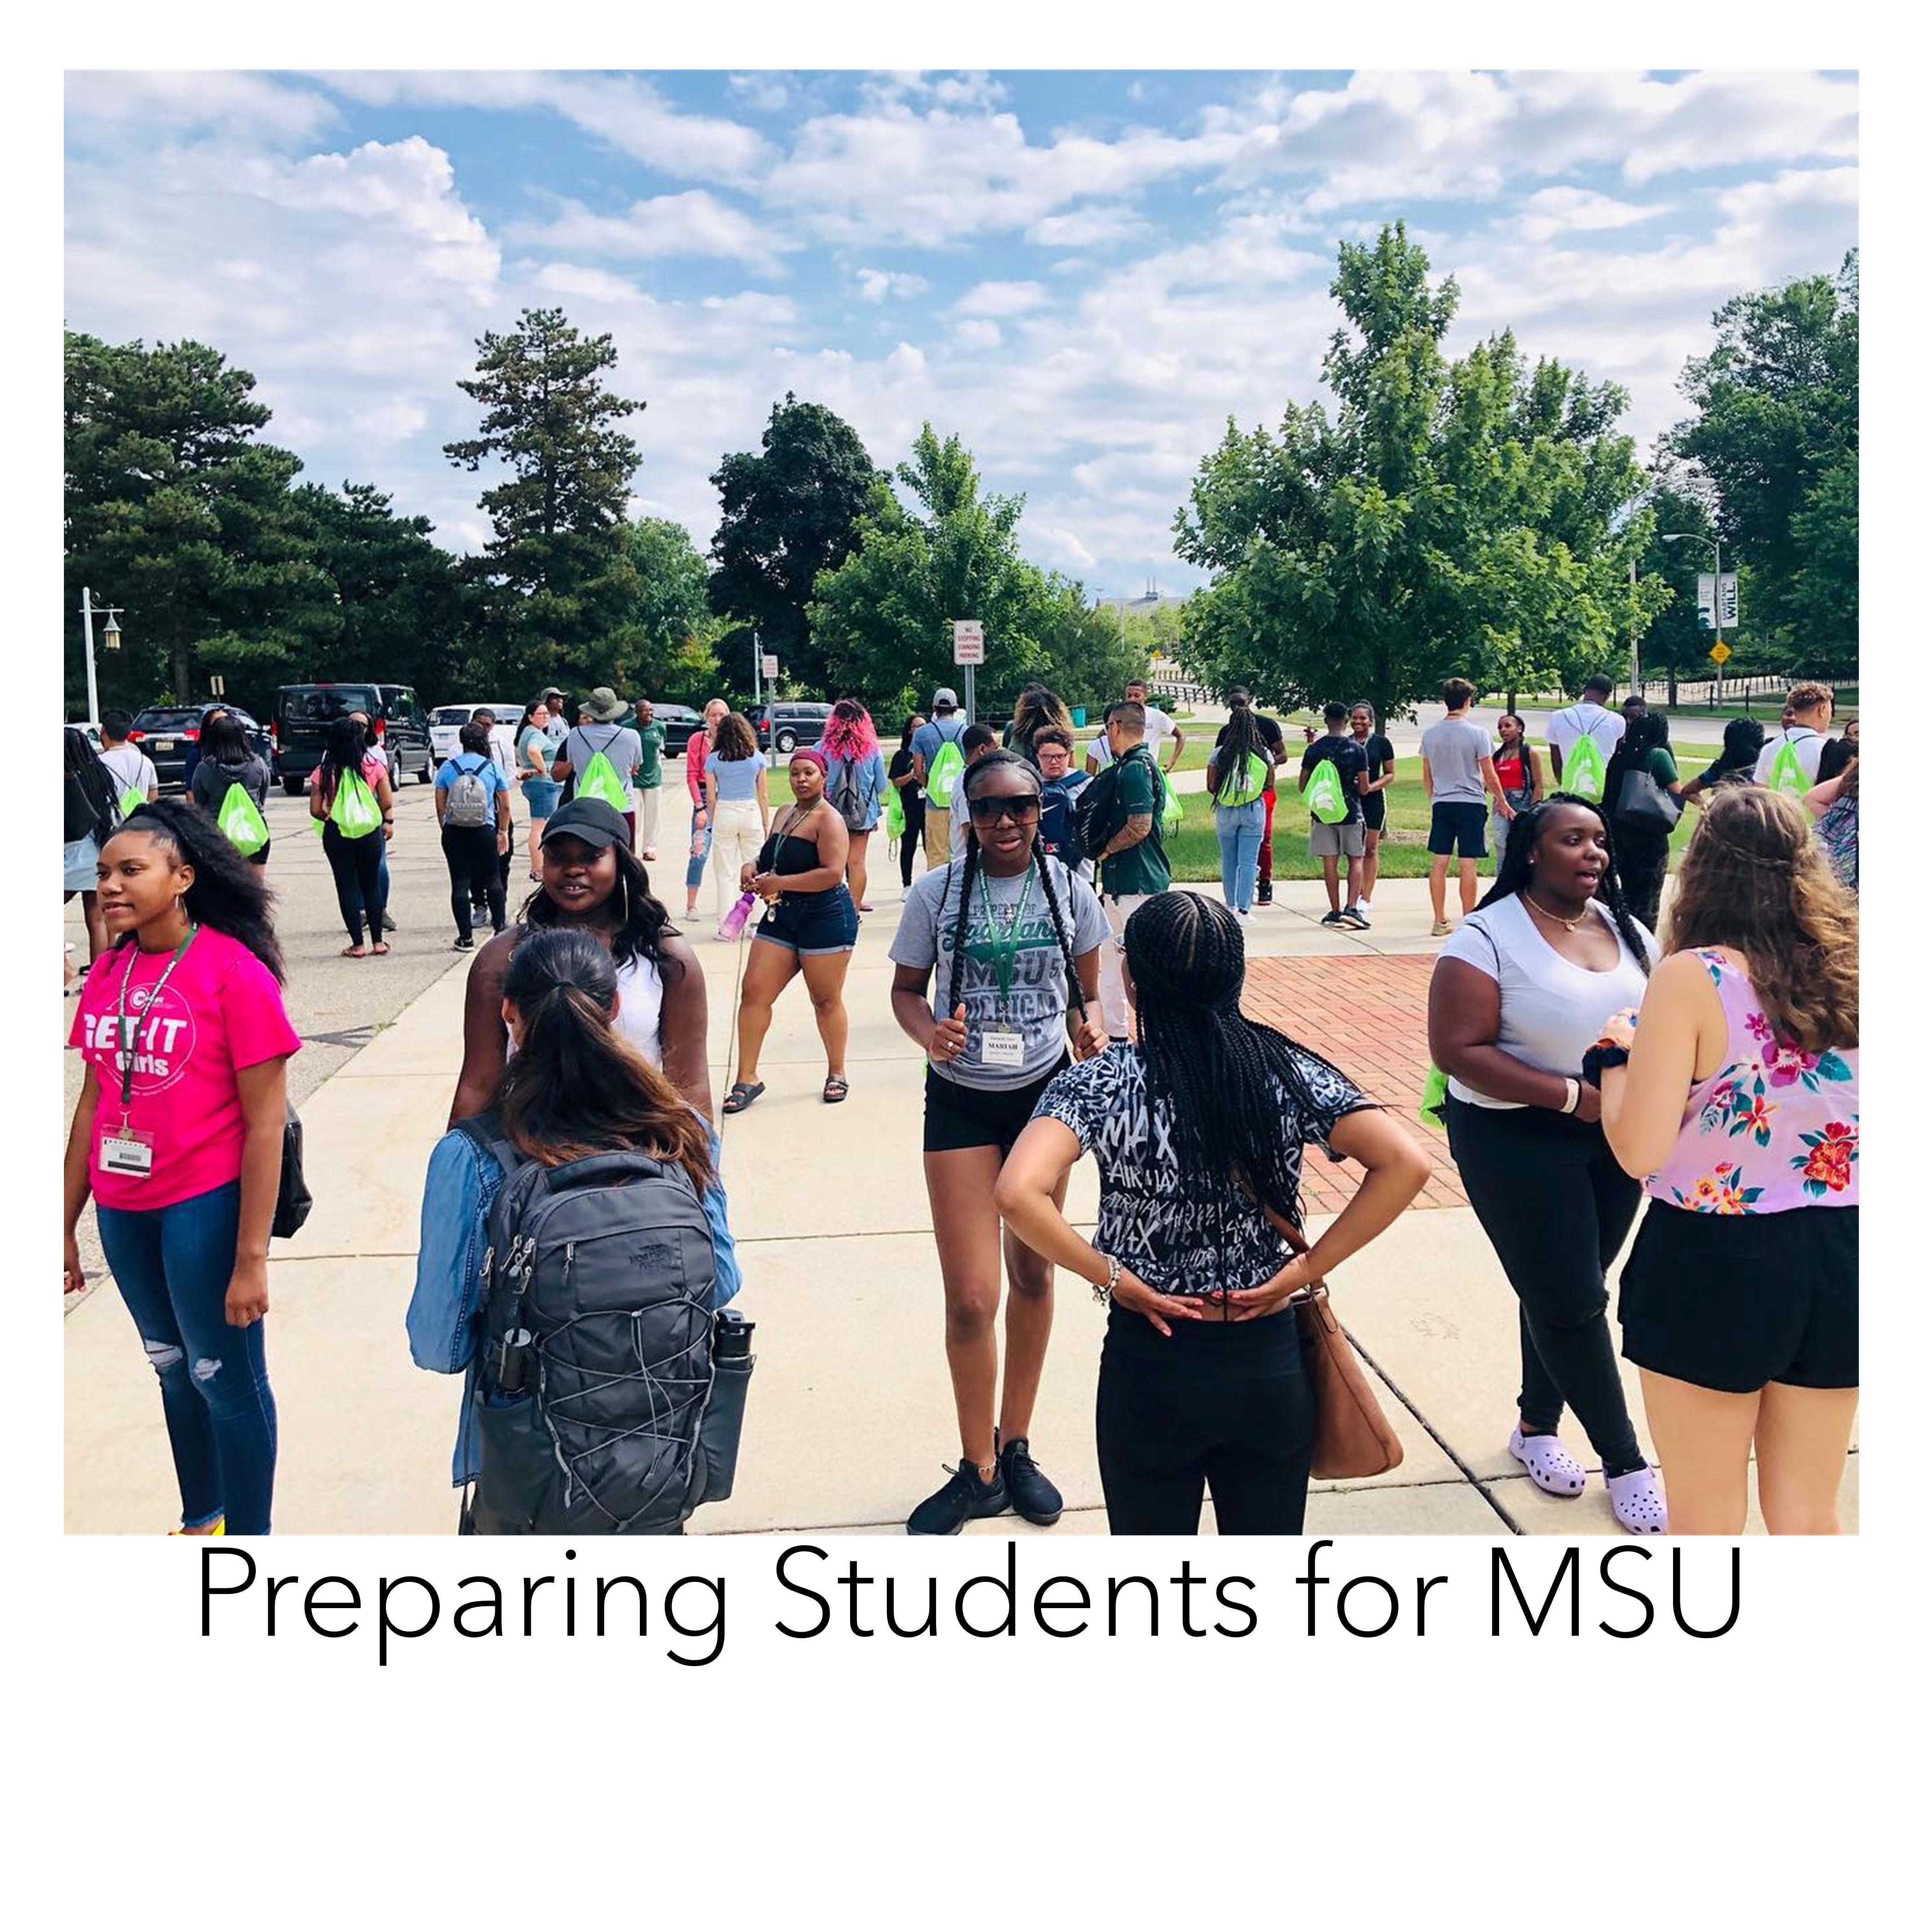 https://ocat.msu.edu/wp-content/uploads/2020/07/Preparing-Students-for-MSU.jpg